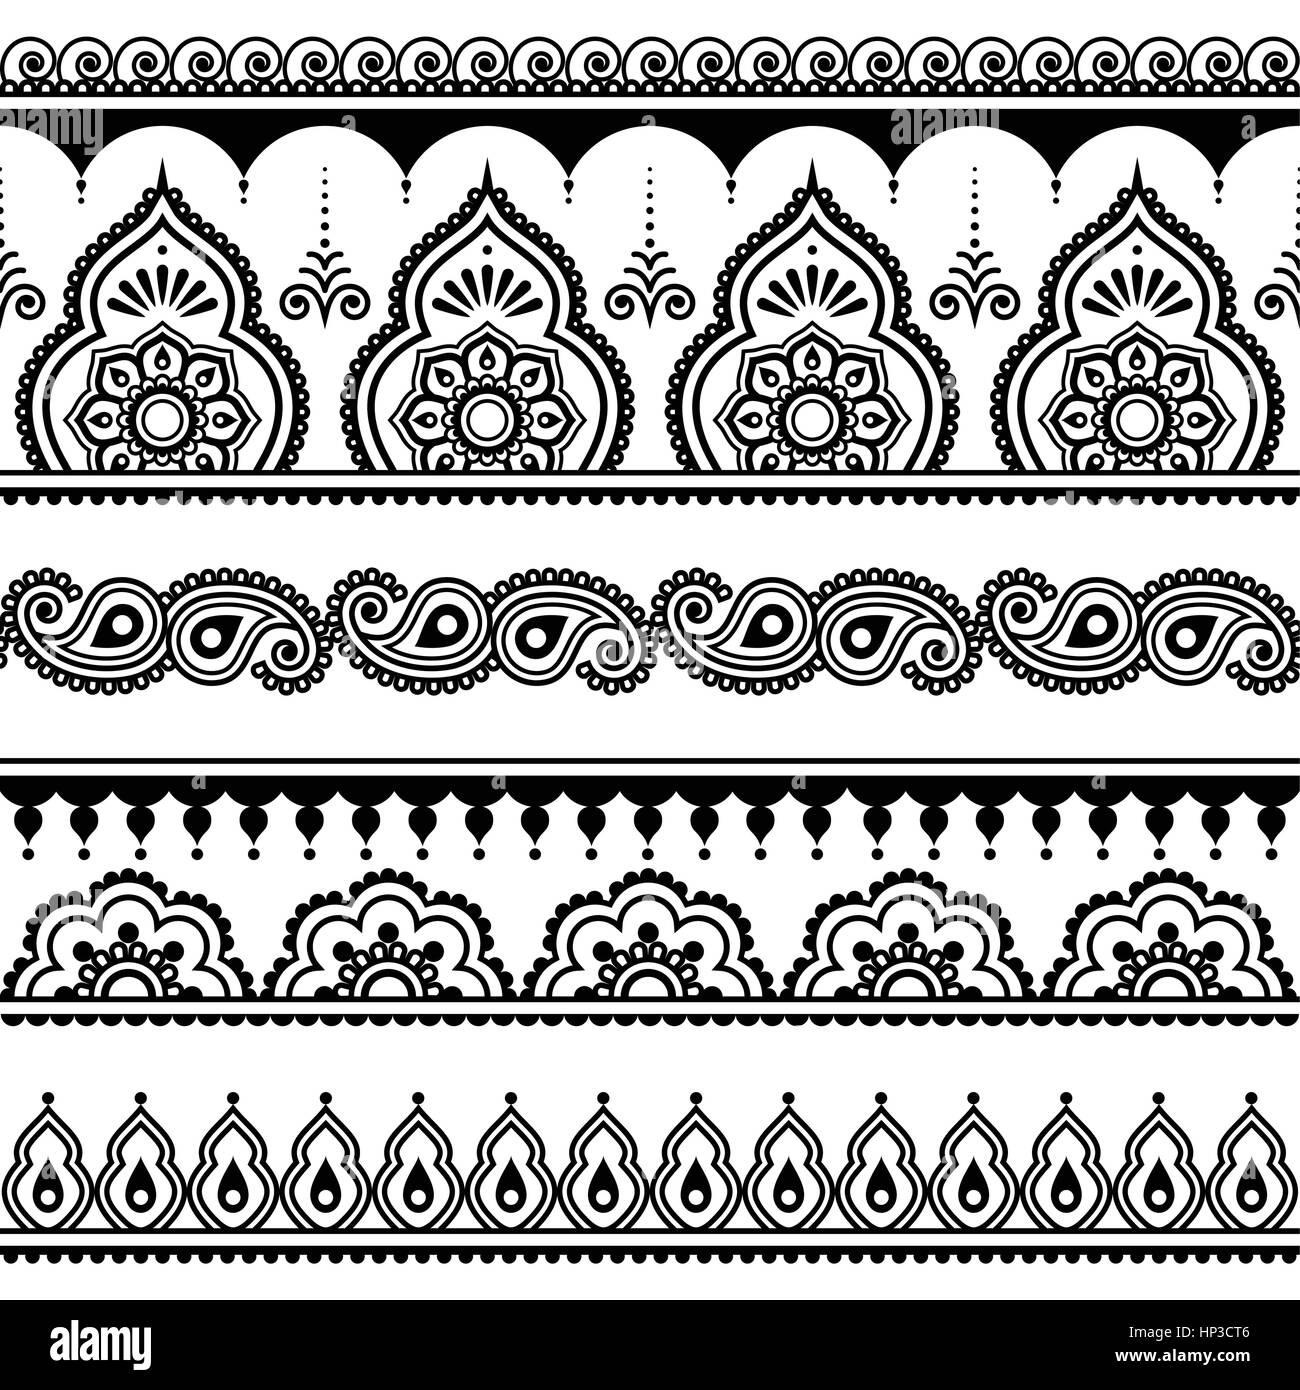 mehndi indische henna tattoo nahtloses muster design. Black Bedroom Furniture Sets. Home Design Ideas